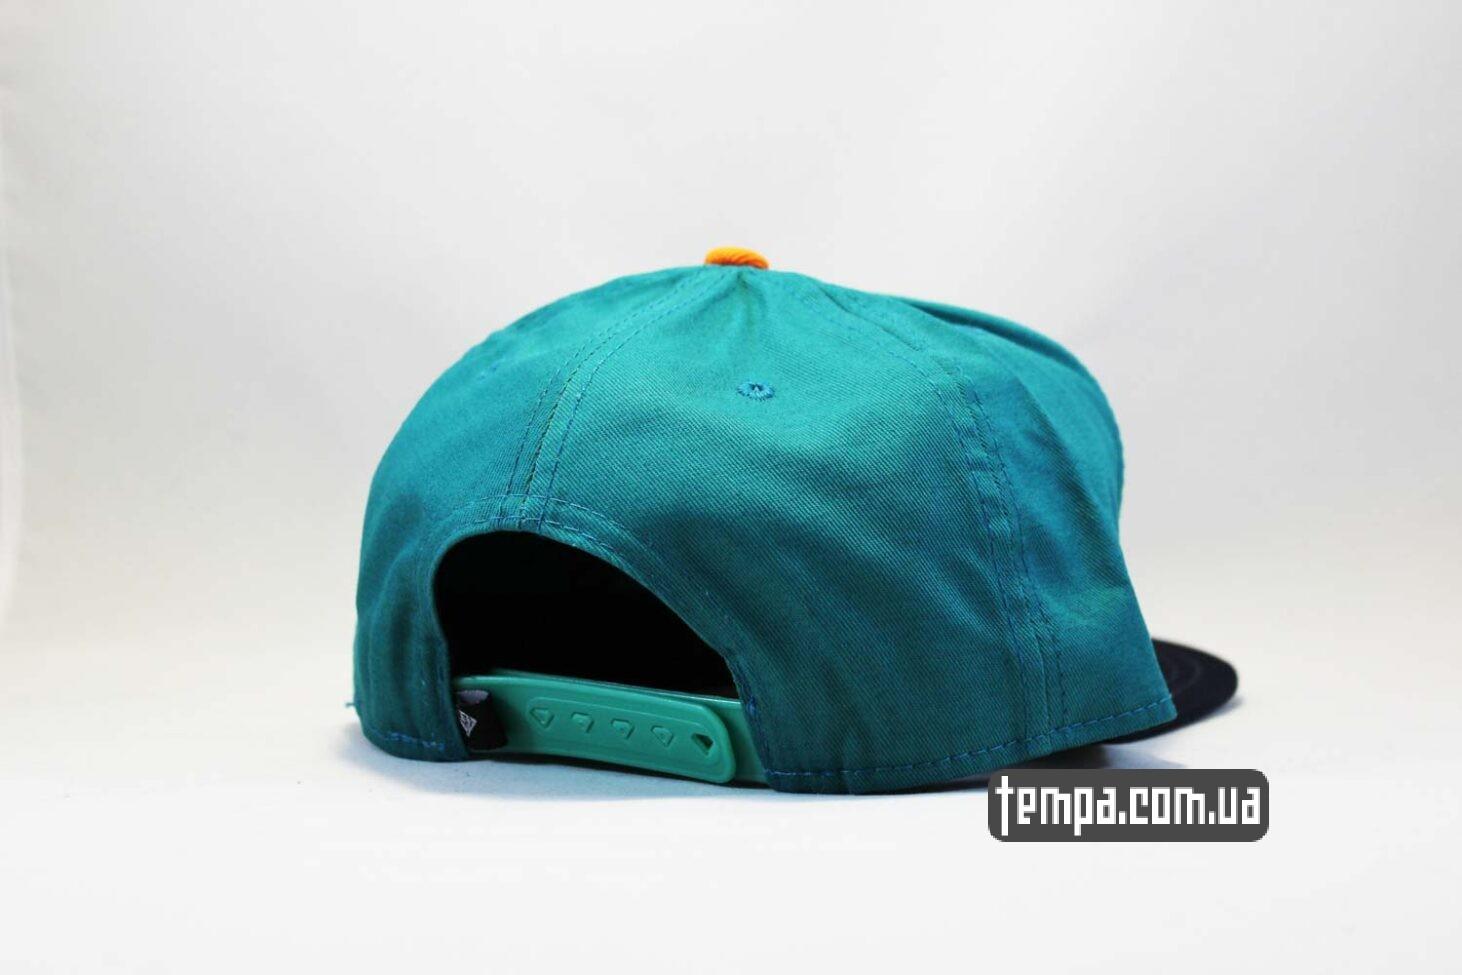 одежда диамонд Украина кепка snapback DIAMOND 1998 зеленая бейсболка